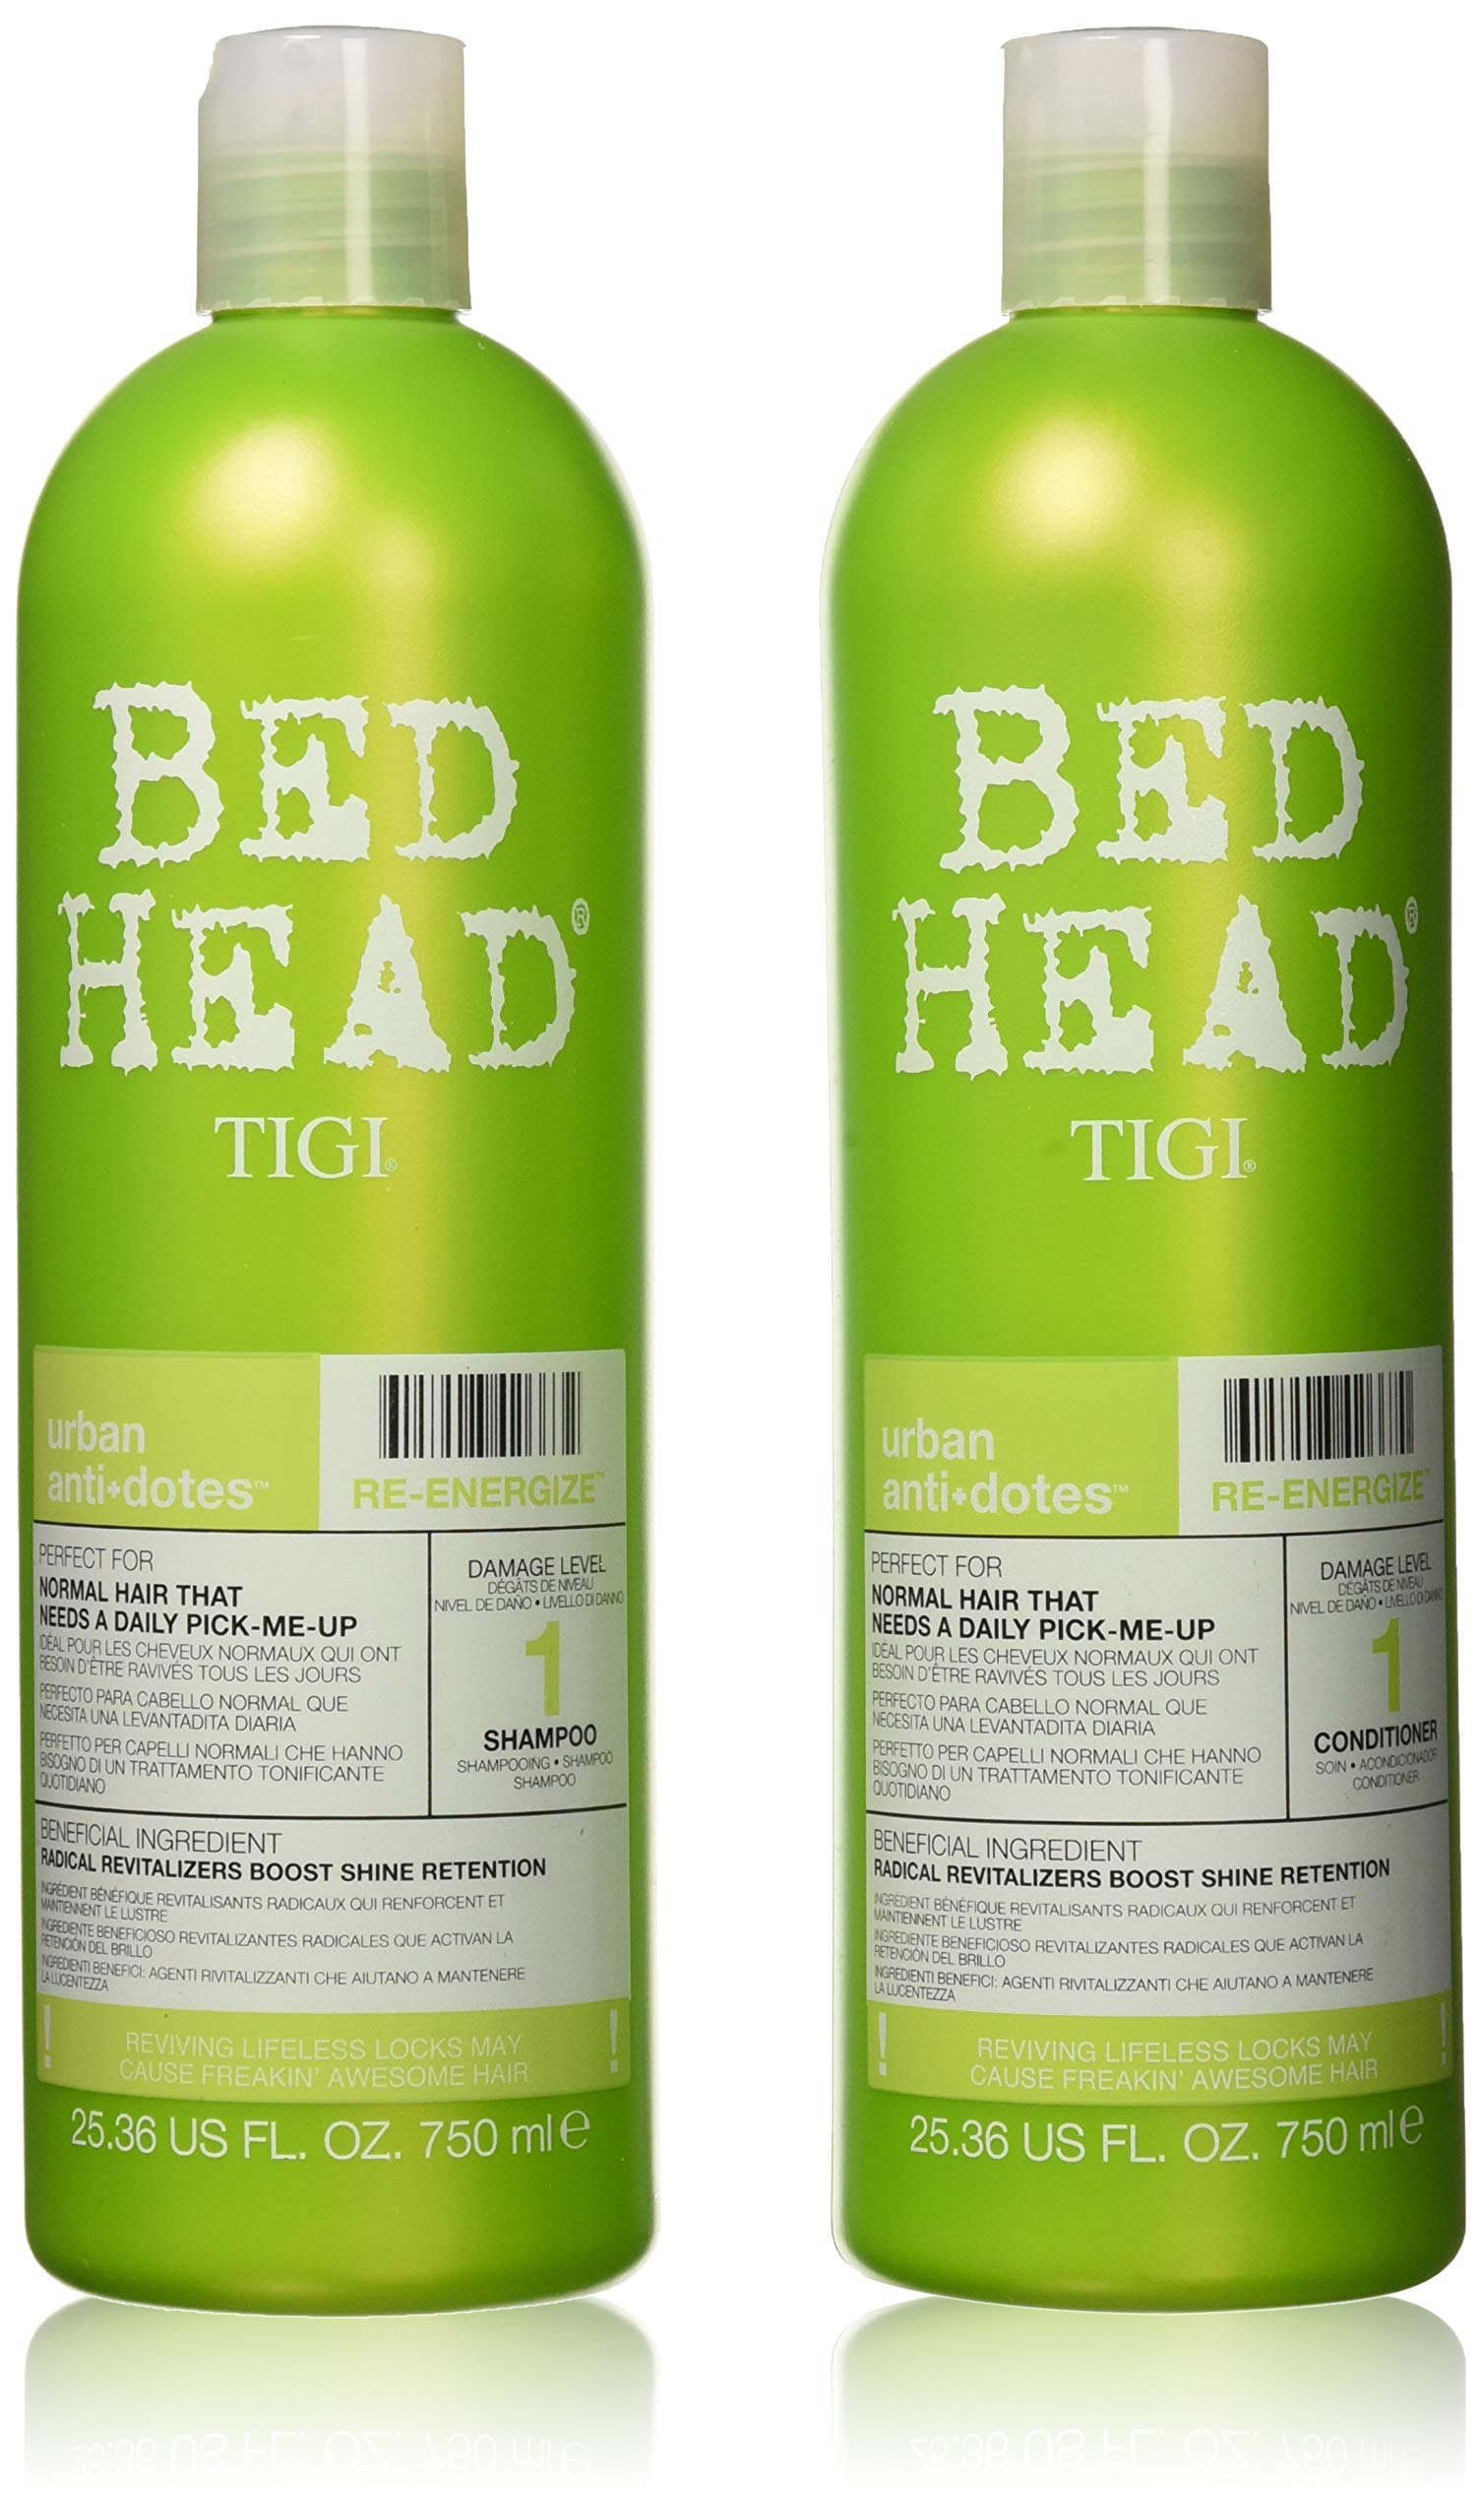 TIGI Bed Head Renergize Shampoo and Conditioner Duo, 25.36 oz by TIGI